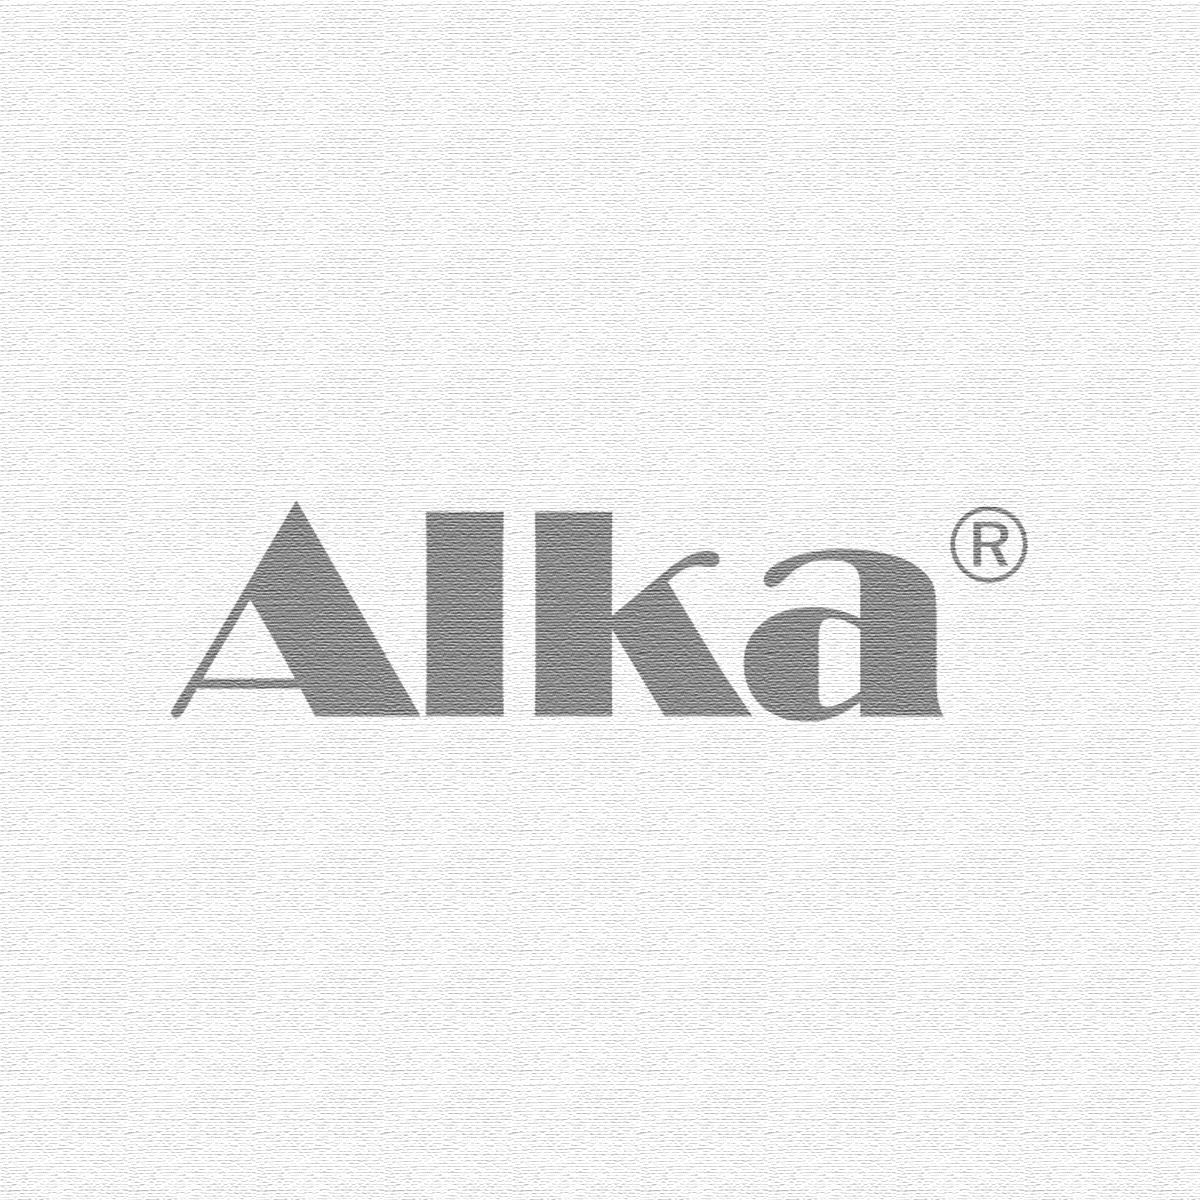 Alka® Drops - 55ml - Dutch label